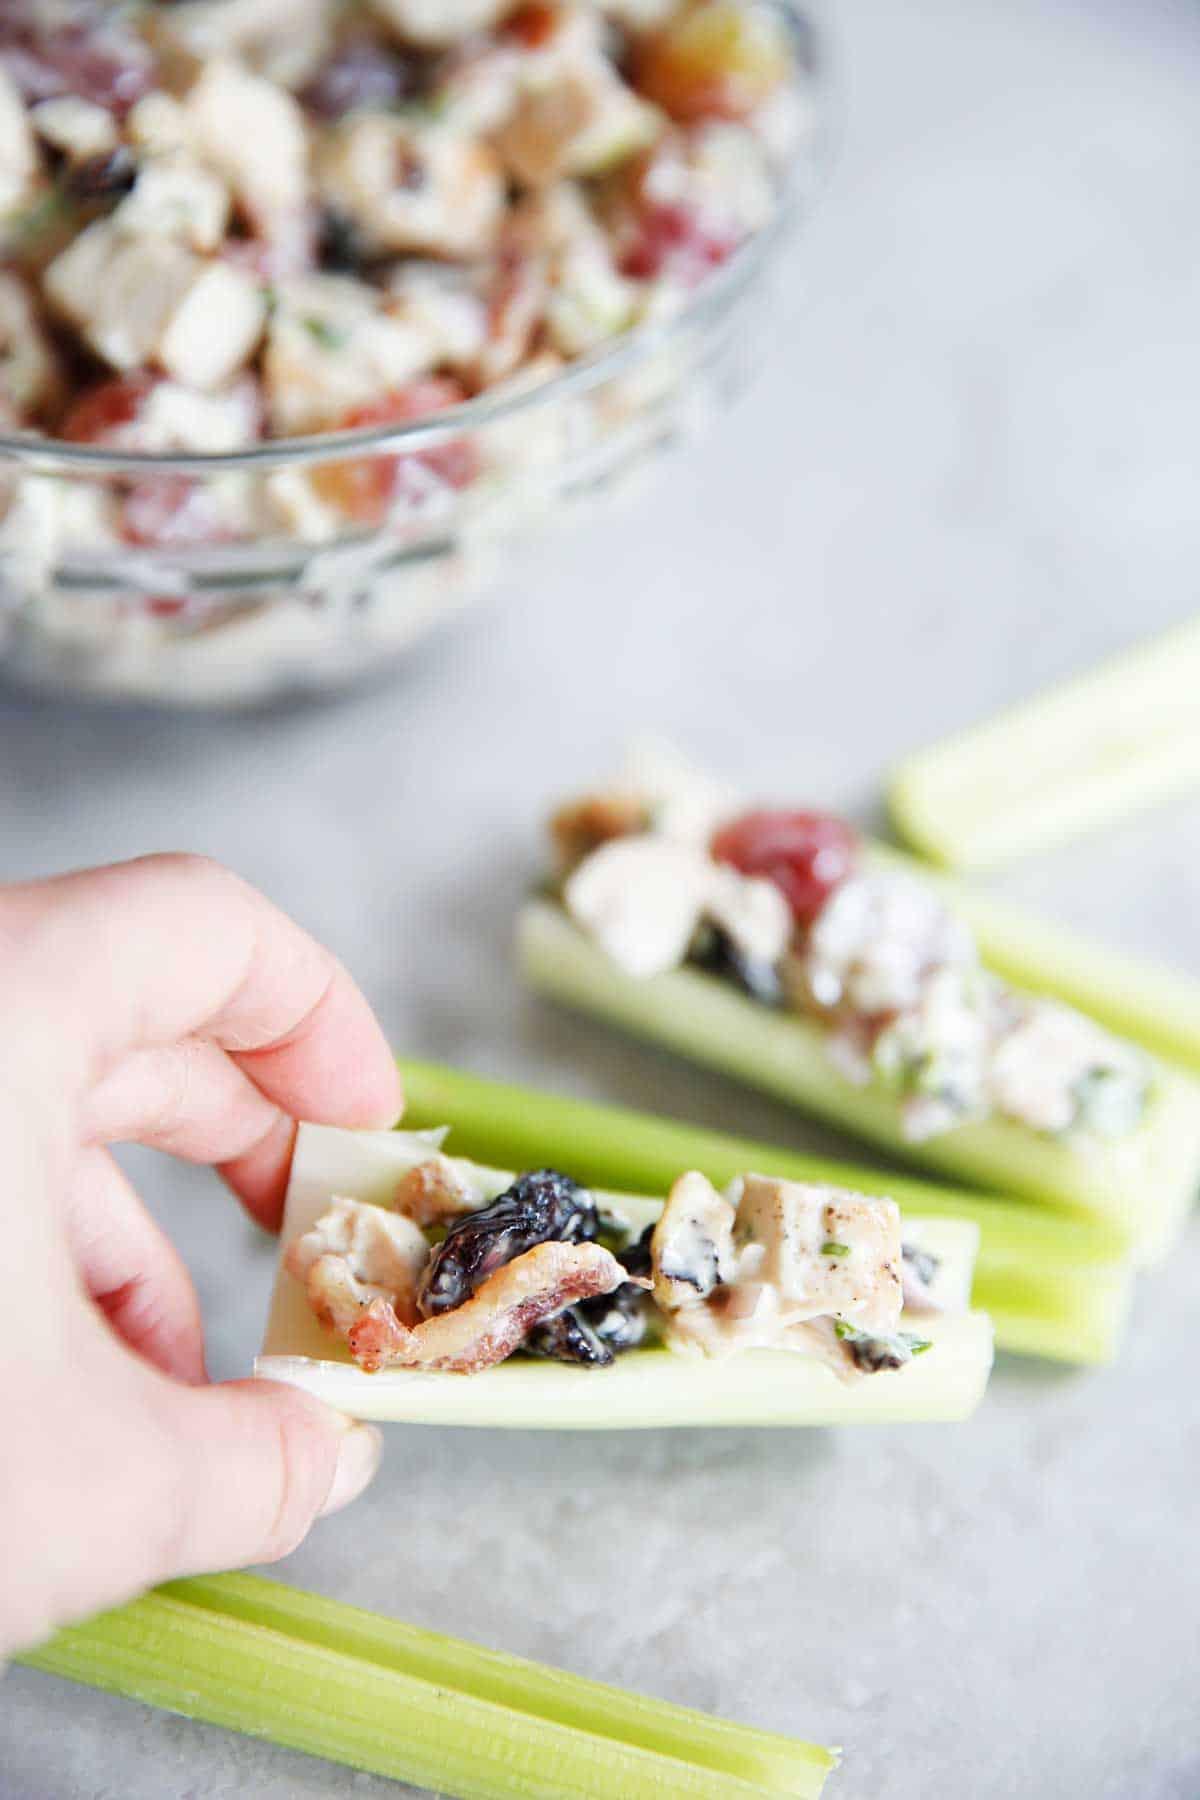 Loaded Chicken Salad Celery Logs | Lexi's Clean Kitchen